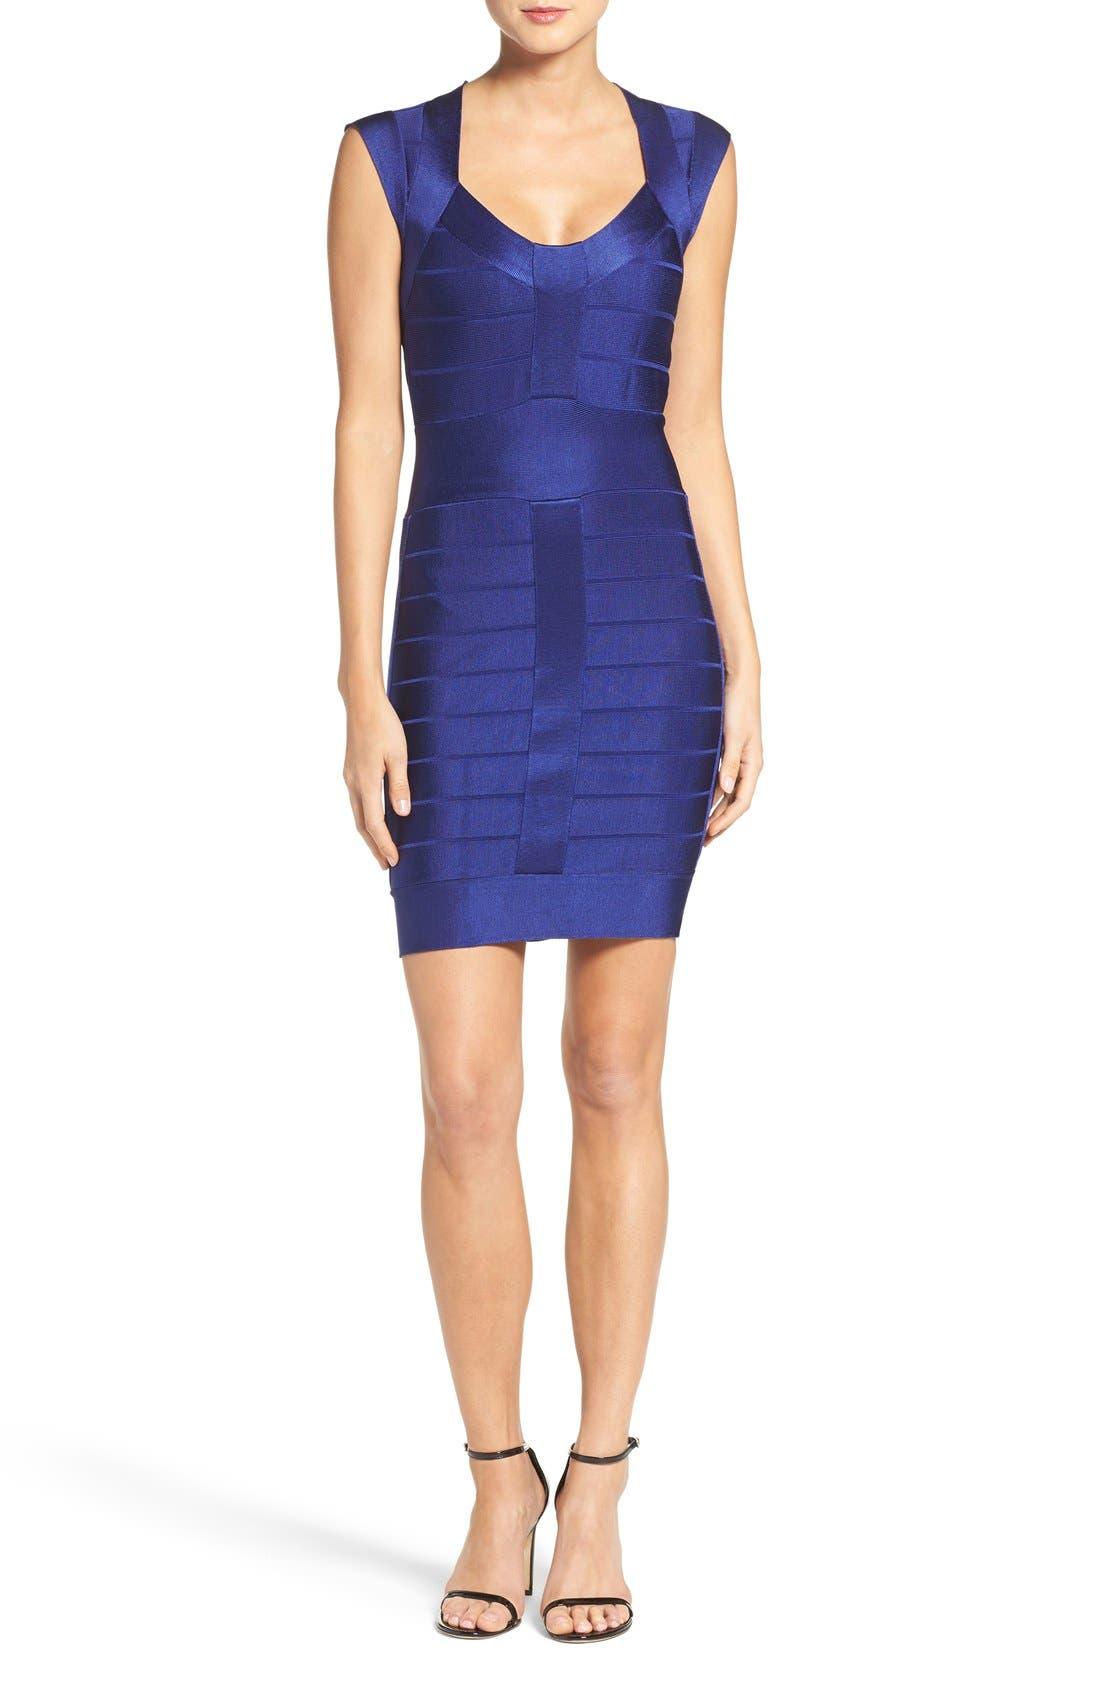 Spotlight Bandage Dress,                             Alternate thumbnail 4, color,                             Maya Blue